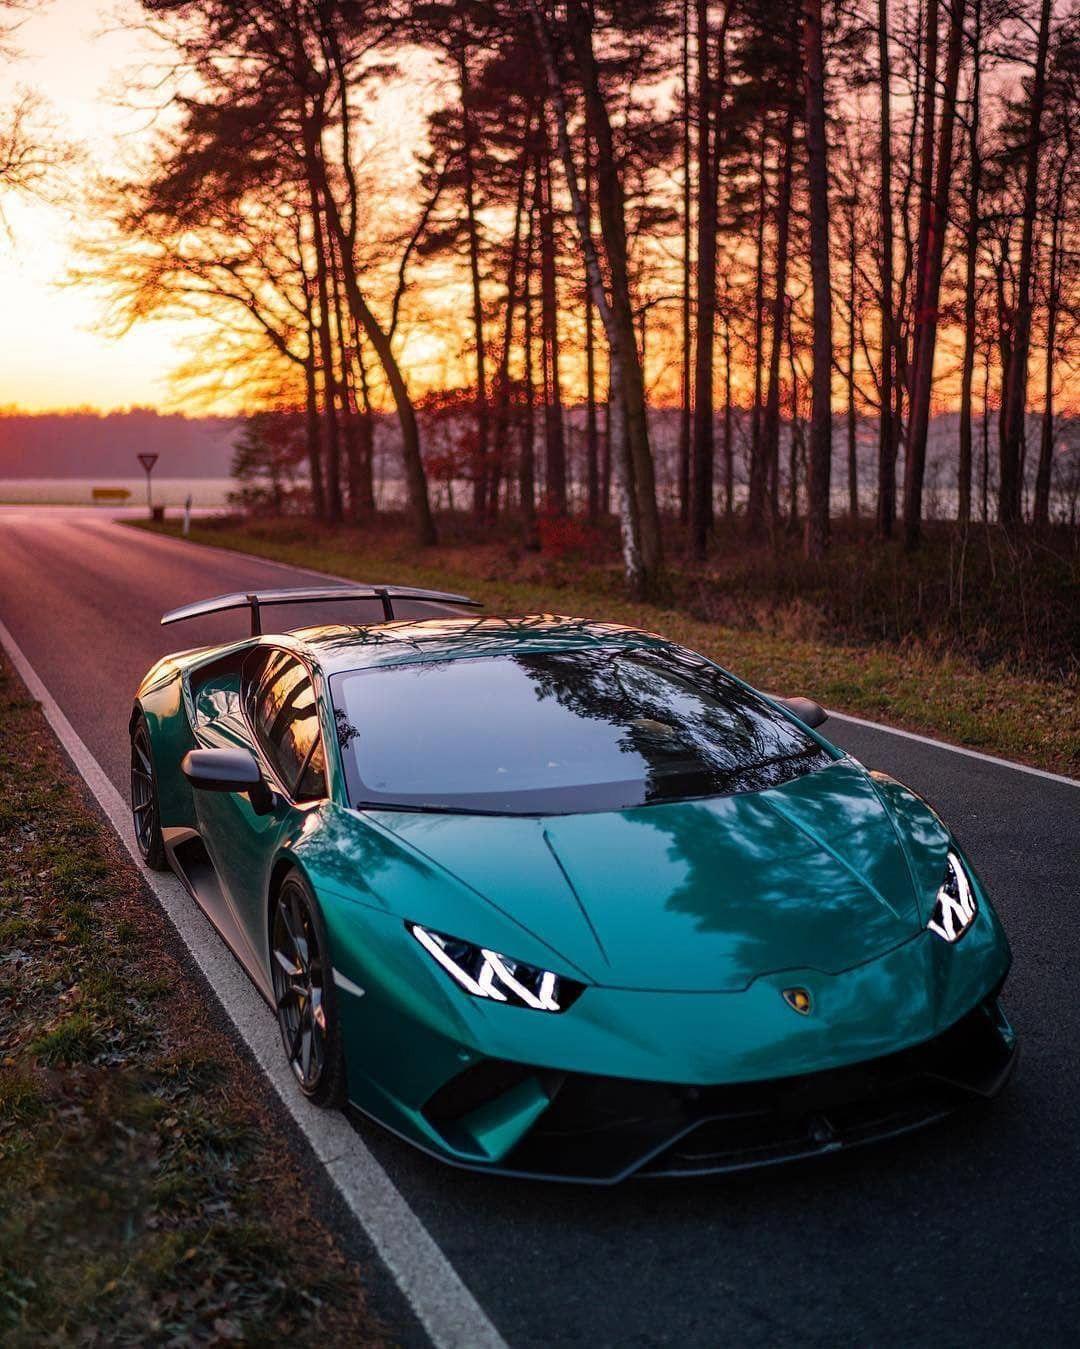 Green Colored Lamborghini Lamborghiniaventador Autos Lujosos Autos Deportivos De Lujo Coches Deportivos De Lujo